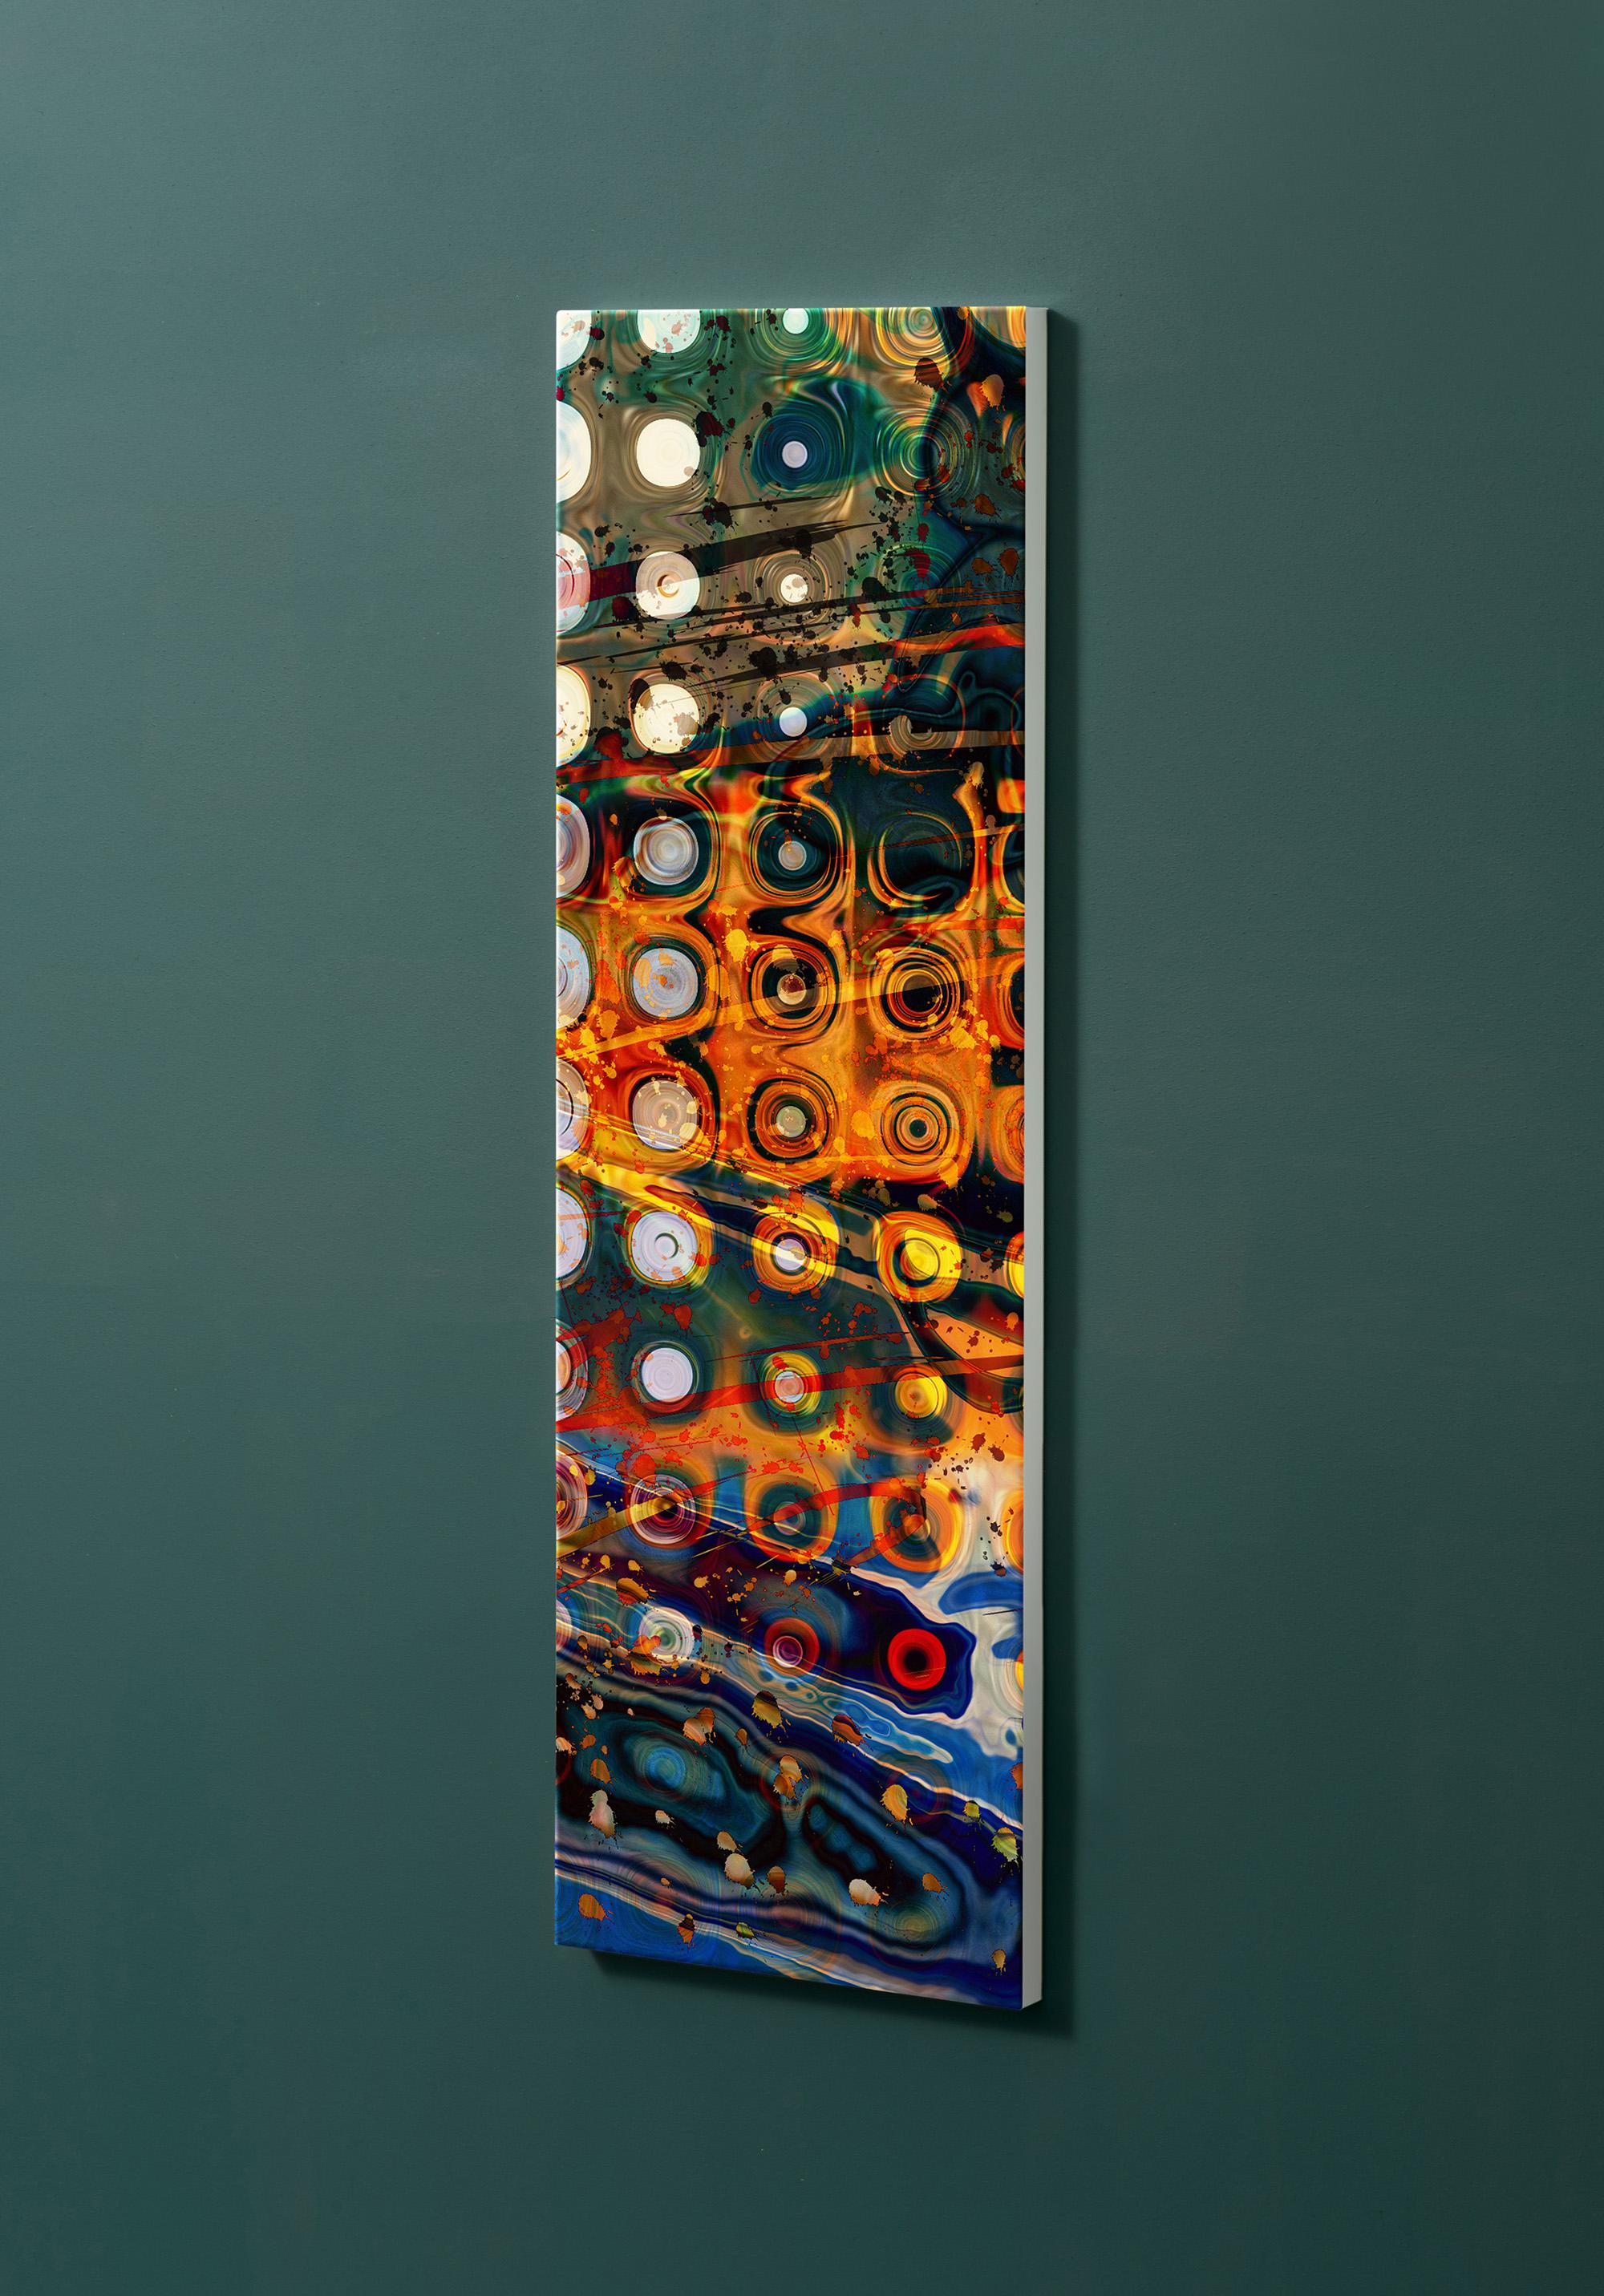 Magnettafel NOTIZ 30x90cm Motiv-Pinnwand M14 Abstrakt Kunst